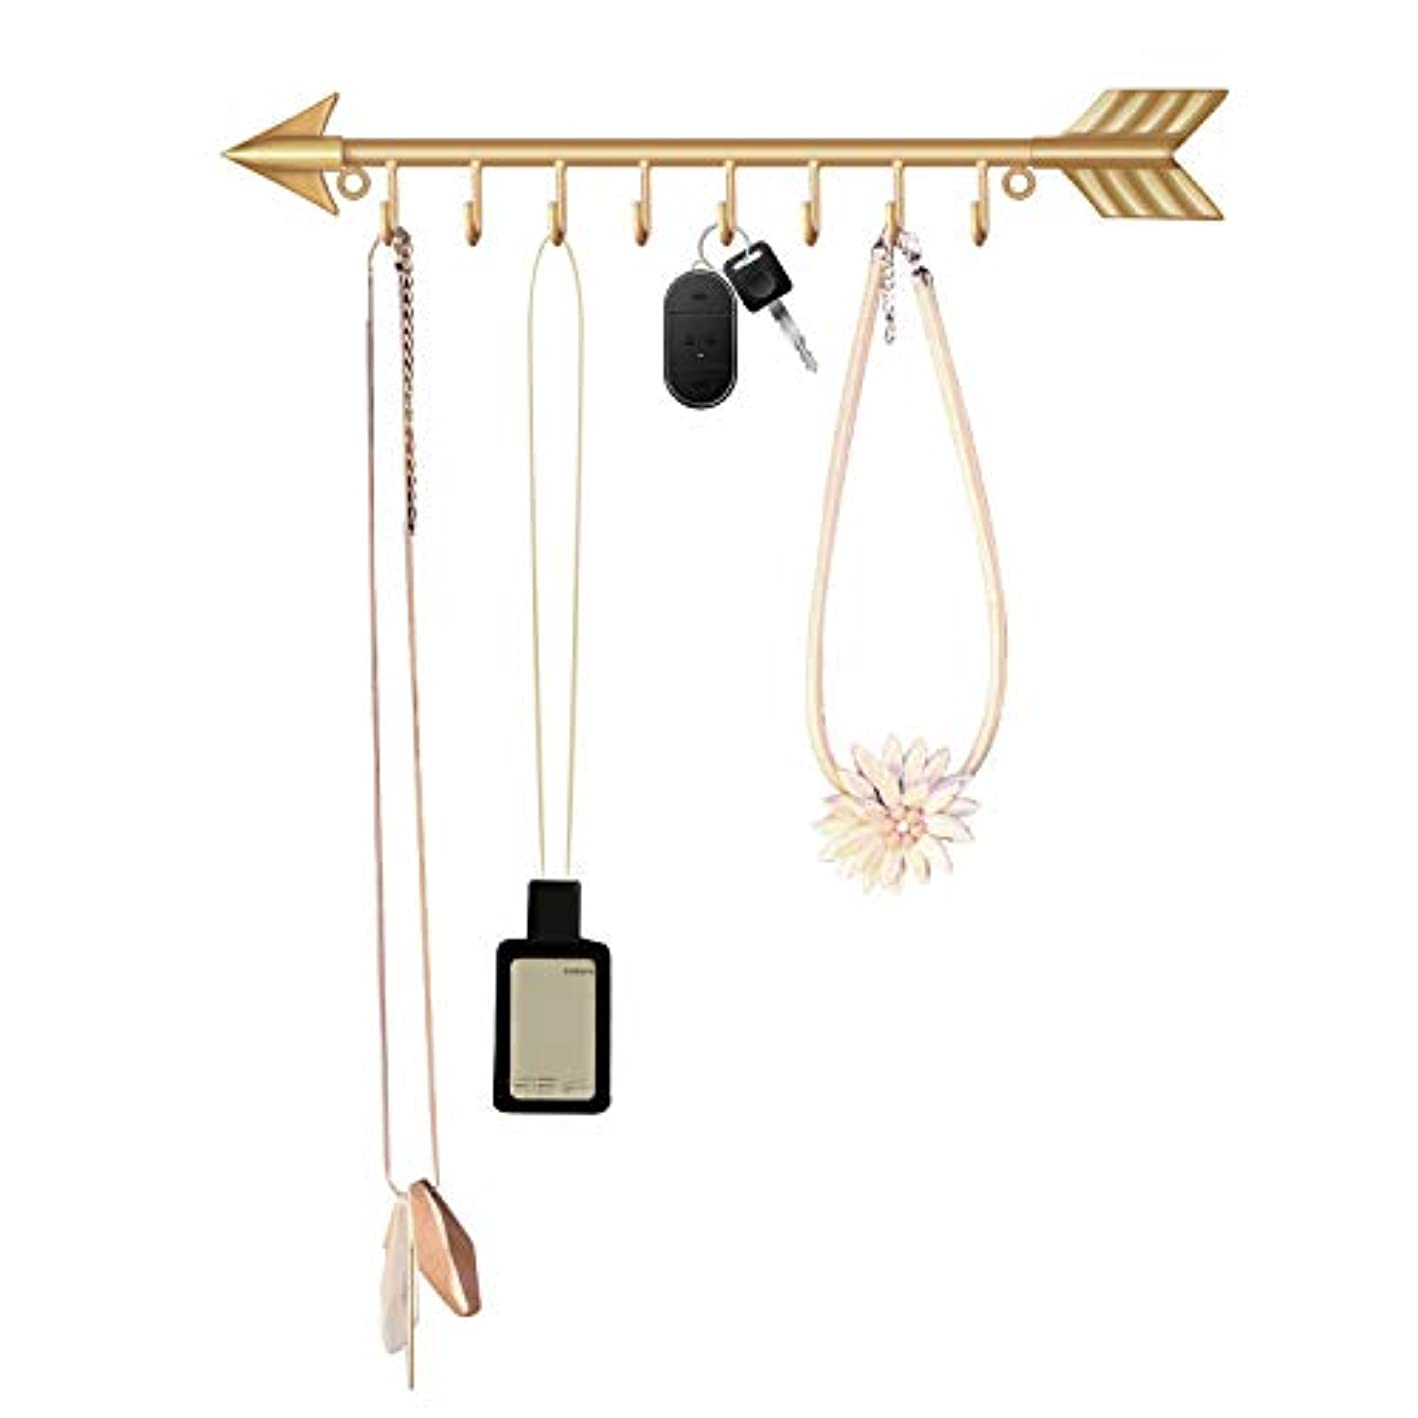 Wall Mounted Key Rack Key Holder Metal Key Hanger 7 Hook Necklace Holder Necklace Organizer Hanging Rack Entryway Storage Organizer Arrow Designed (Gold)